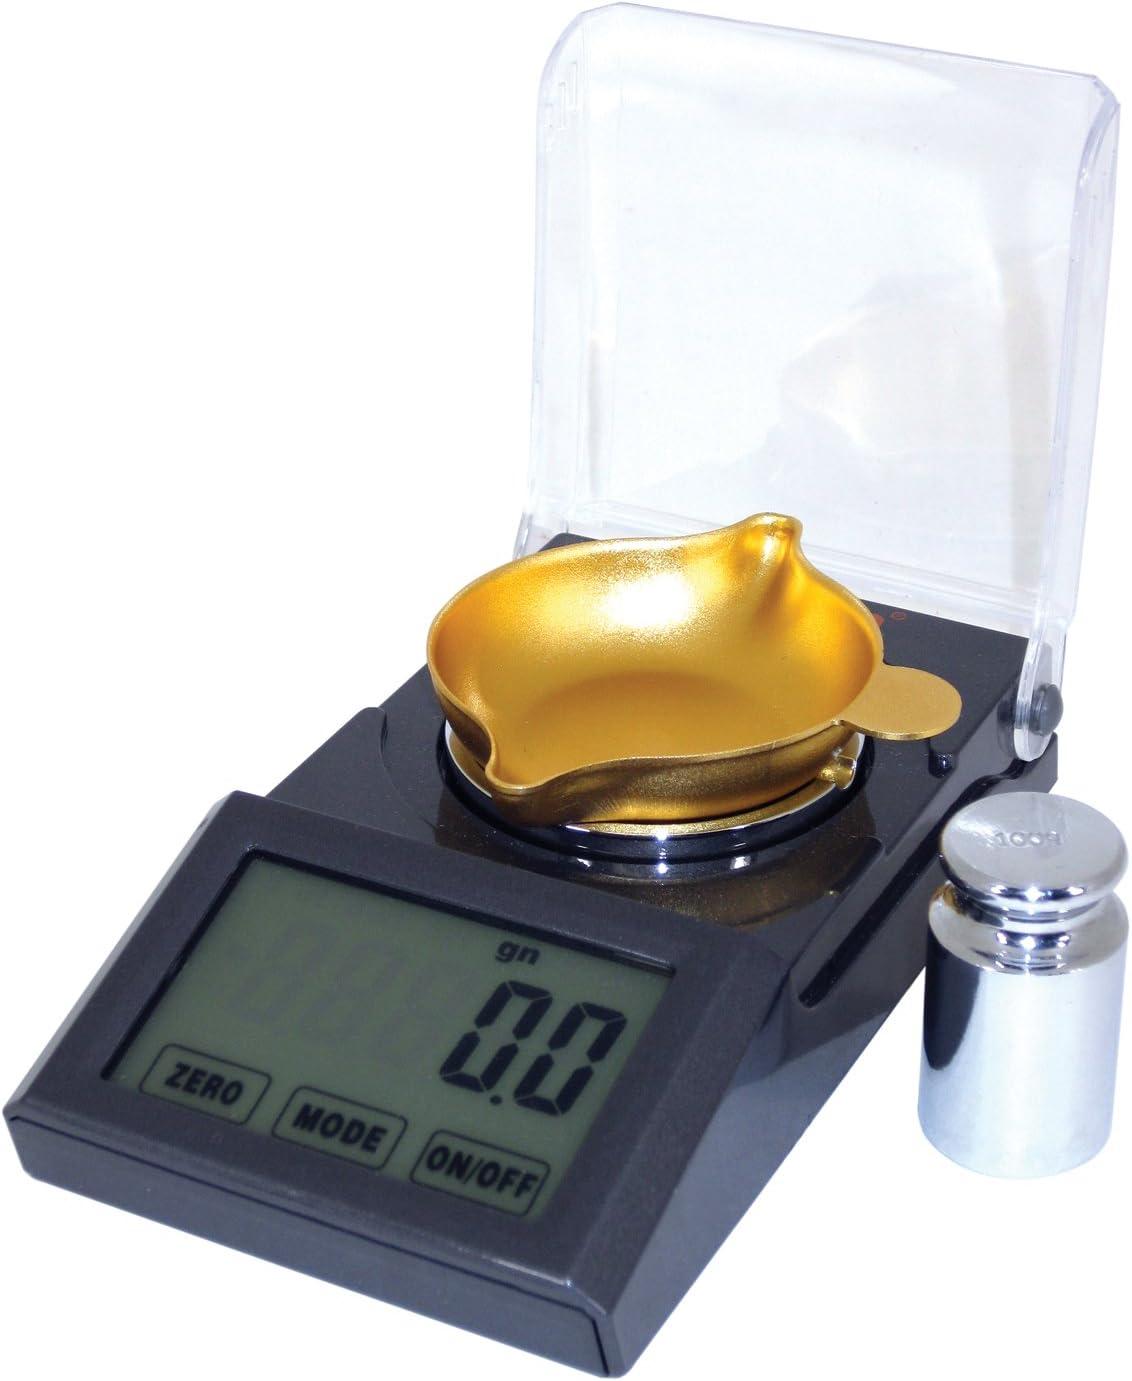 Digital Reloading Scales